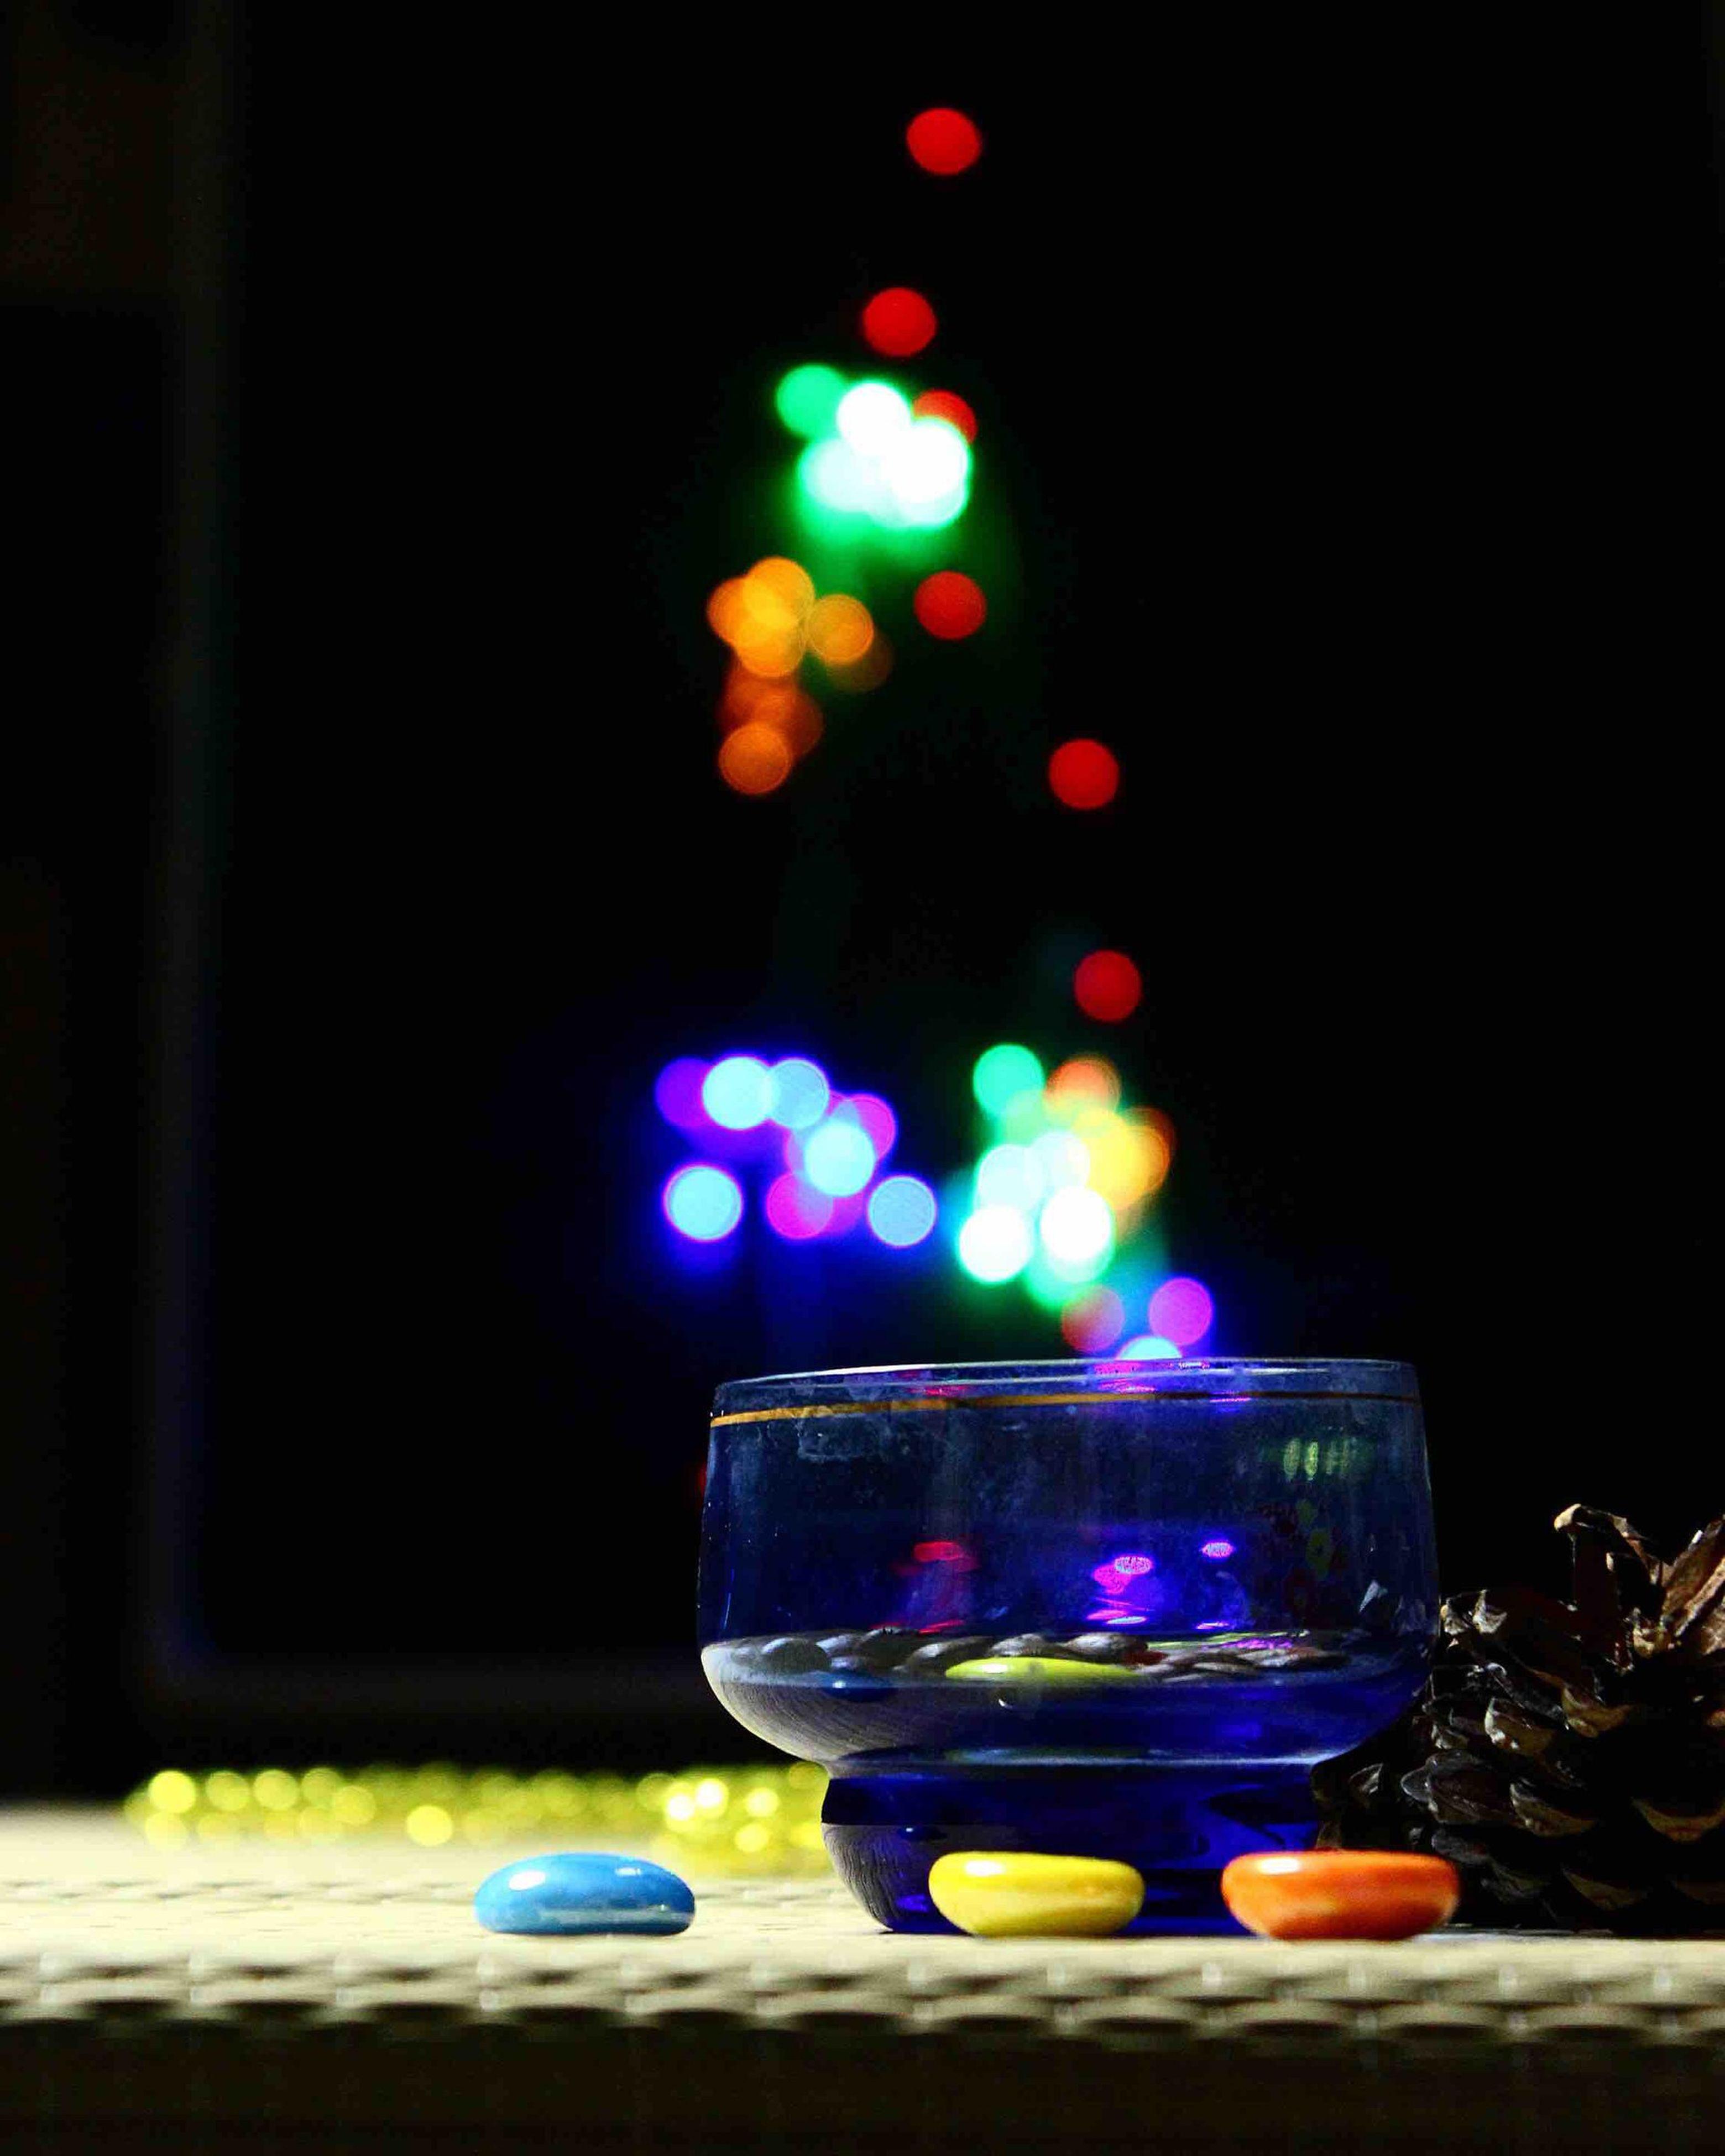 illuminated, christmas lights, lighting equipment, no people, christmas decoration, night, igniting, black background, indoors, christmas tree, christmas ornament